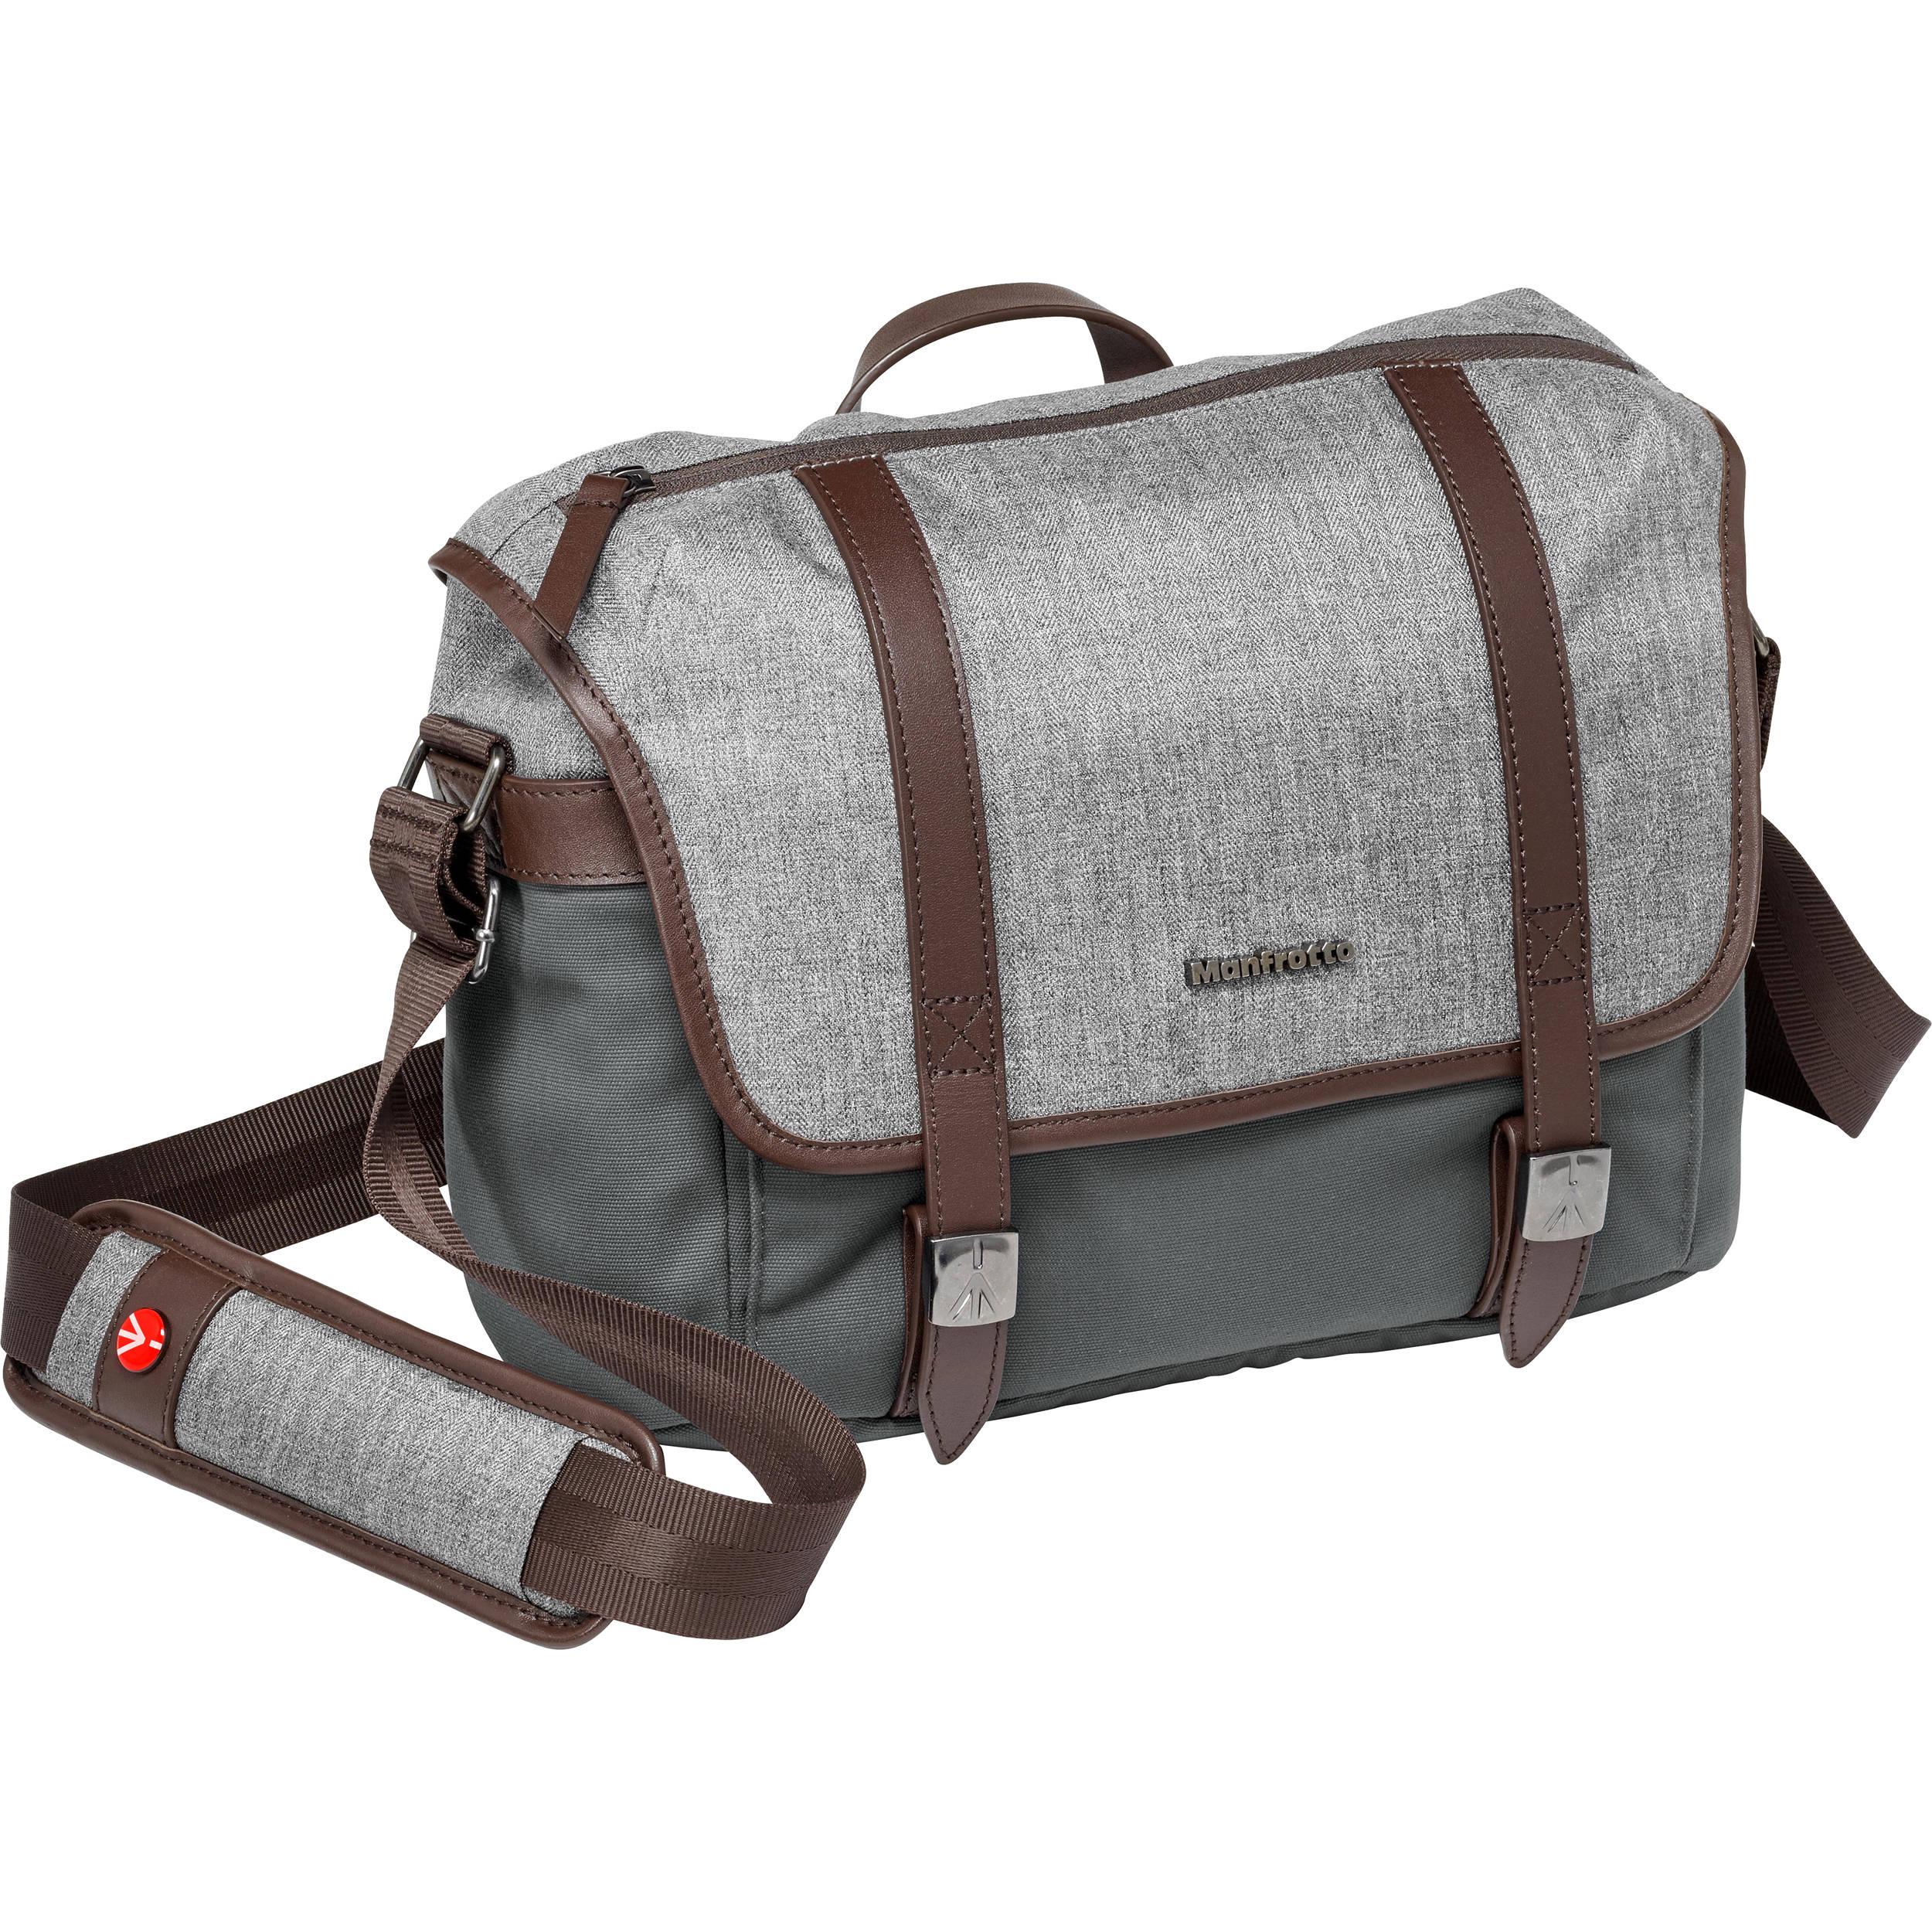 274489591edf6e Manfrotto Windsor Camera Messenger Bag (Small, Gray) MB LF-WN-MS